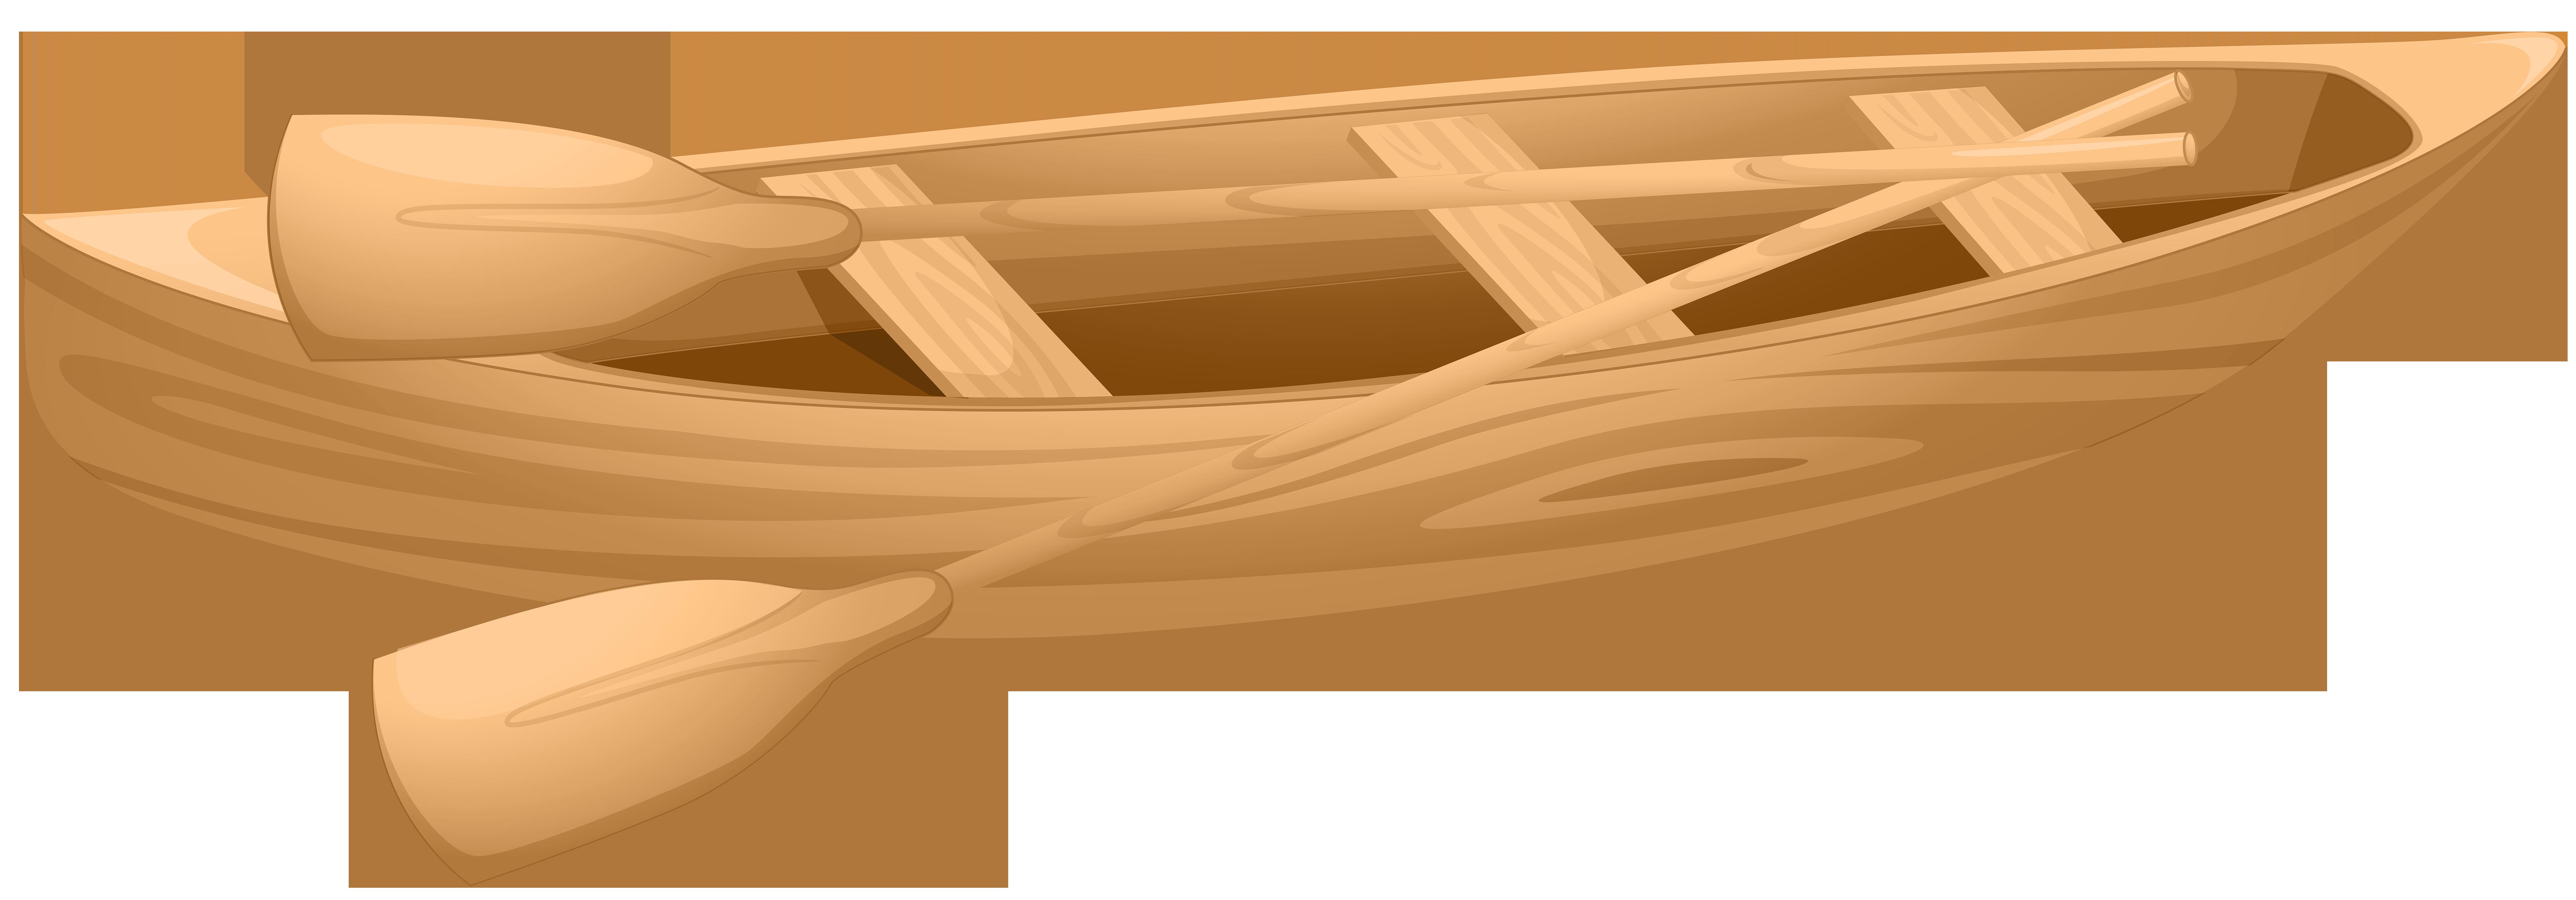 Wooden Boat Clip Art PNG Transparent Image.